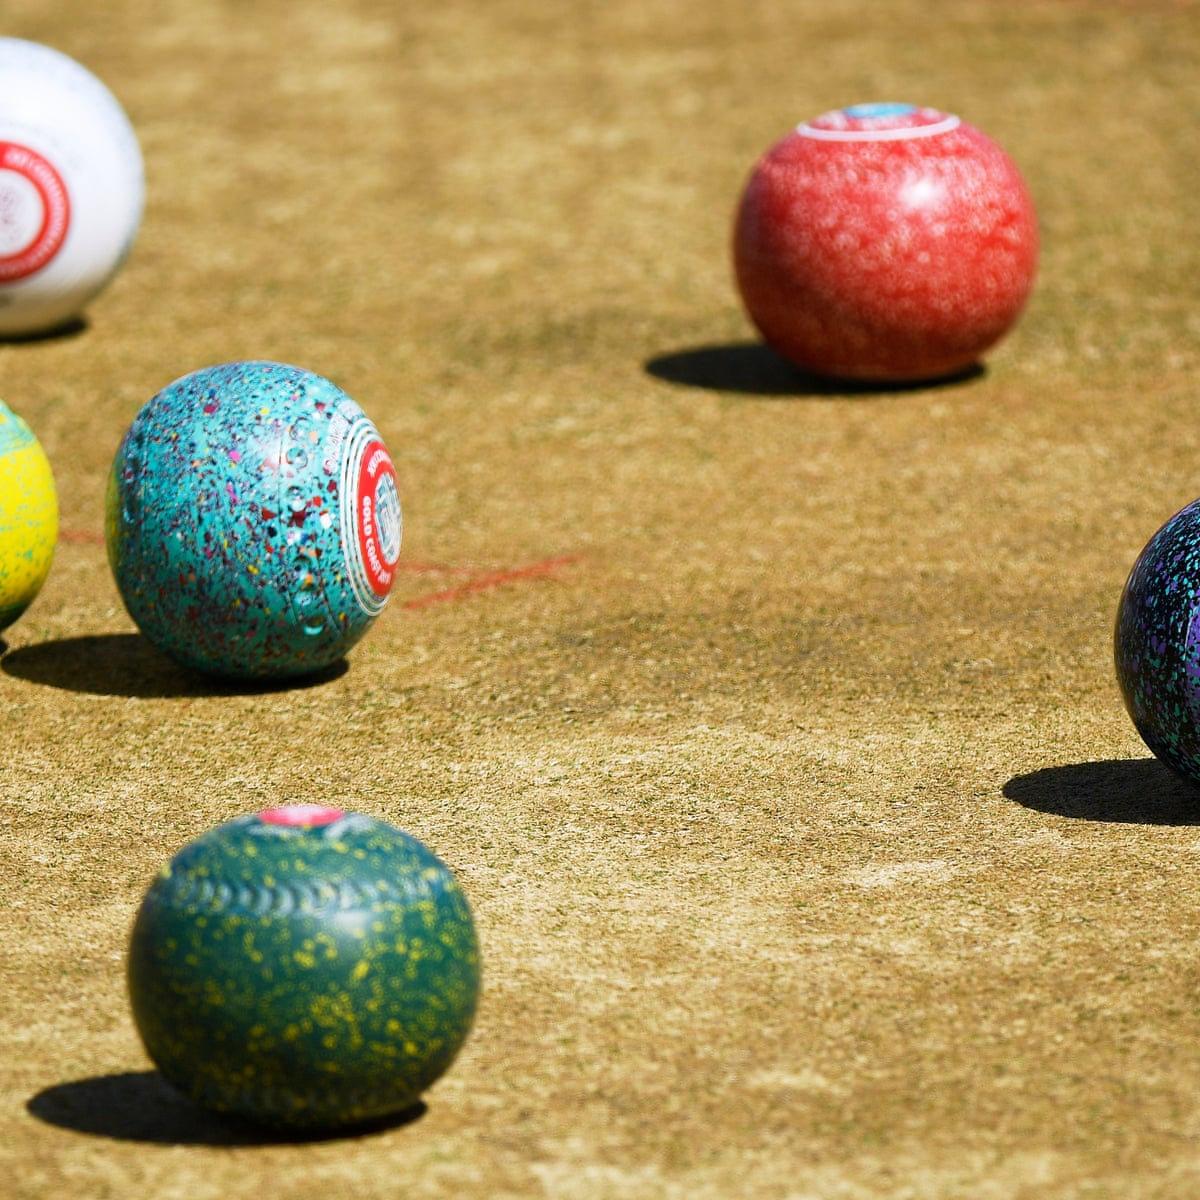 Bowls: Practice